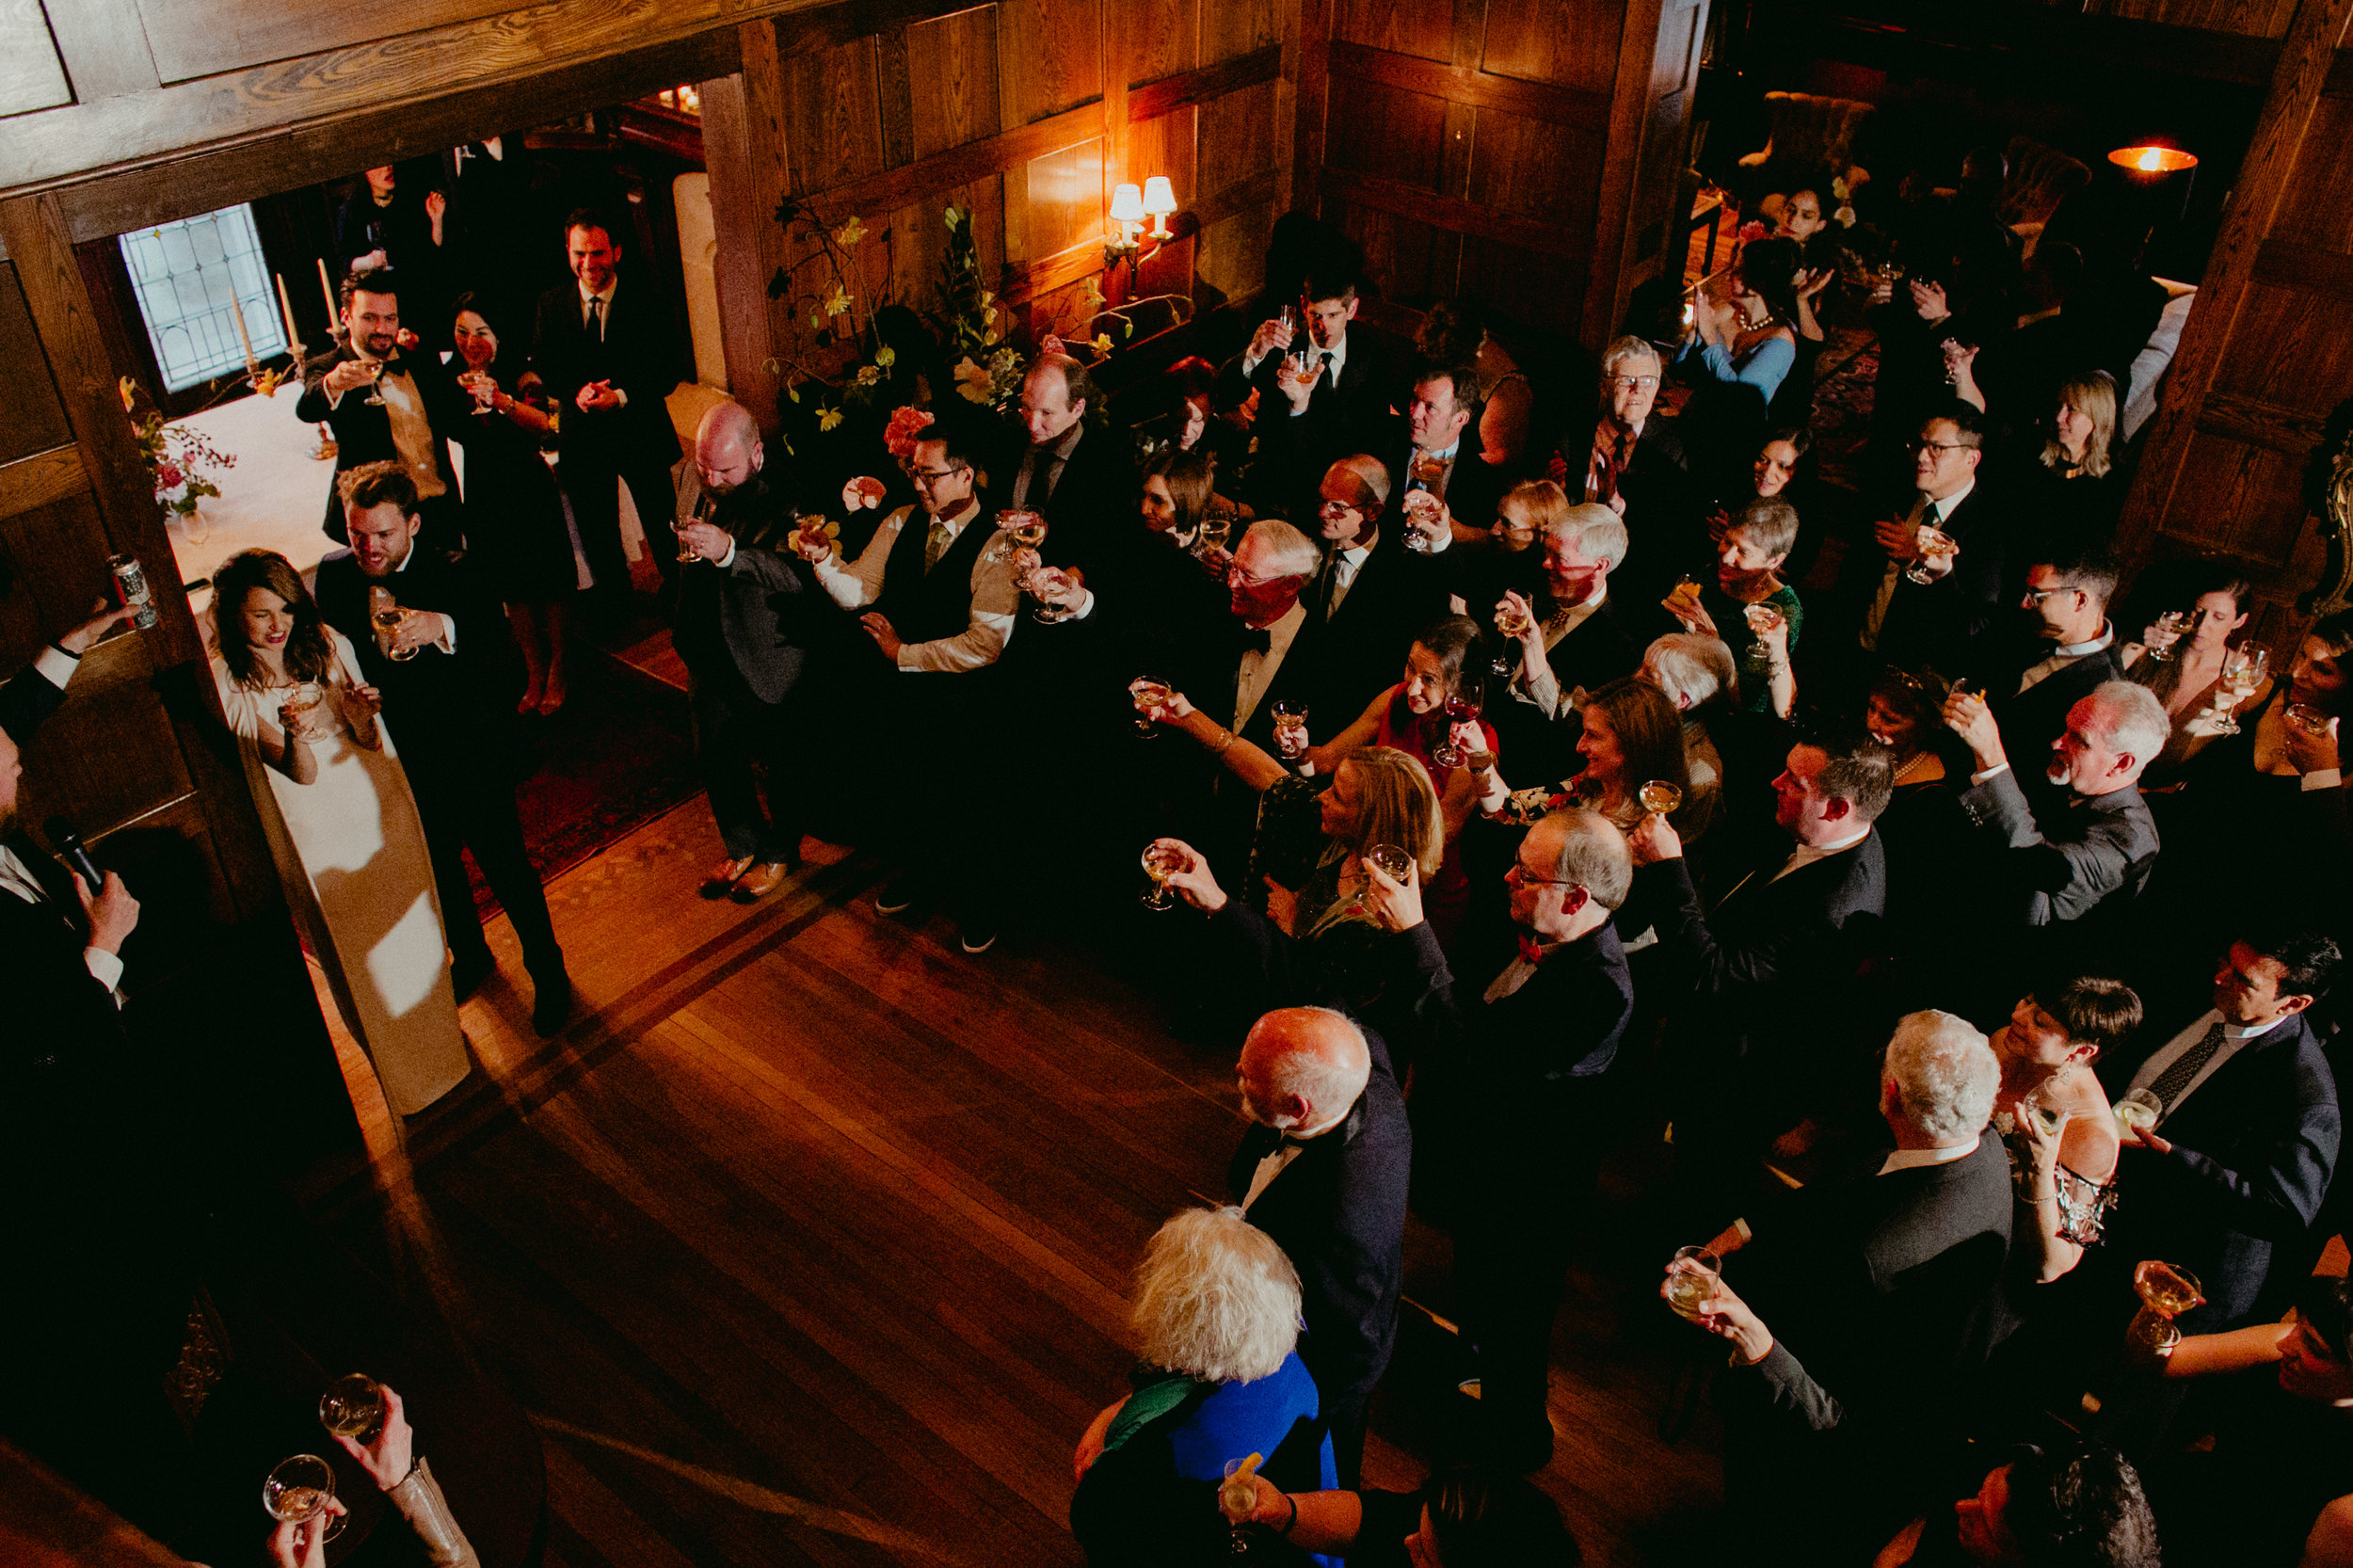 Tiger_House_The_Inn_at_Hudson-Wedding_Chellise_Michael_Photography-389.jpg